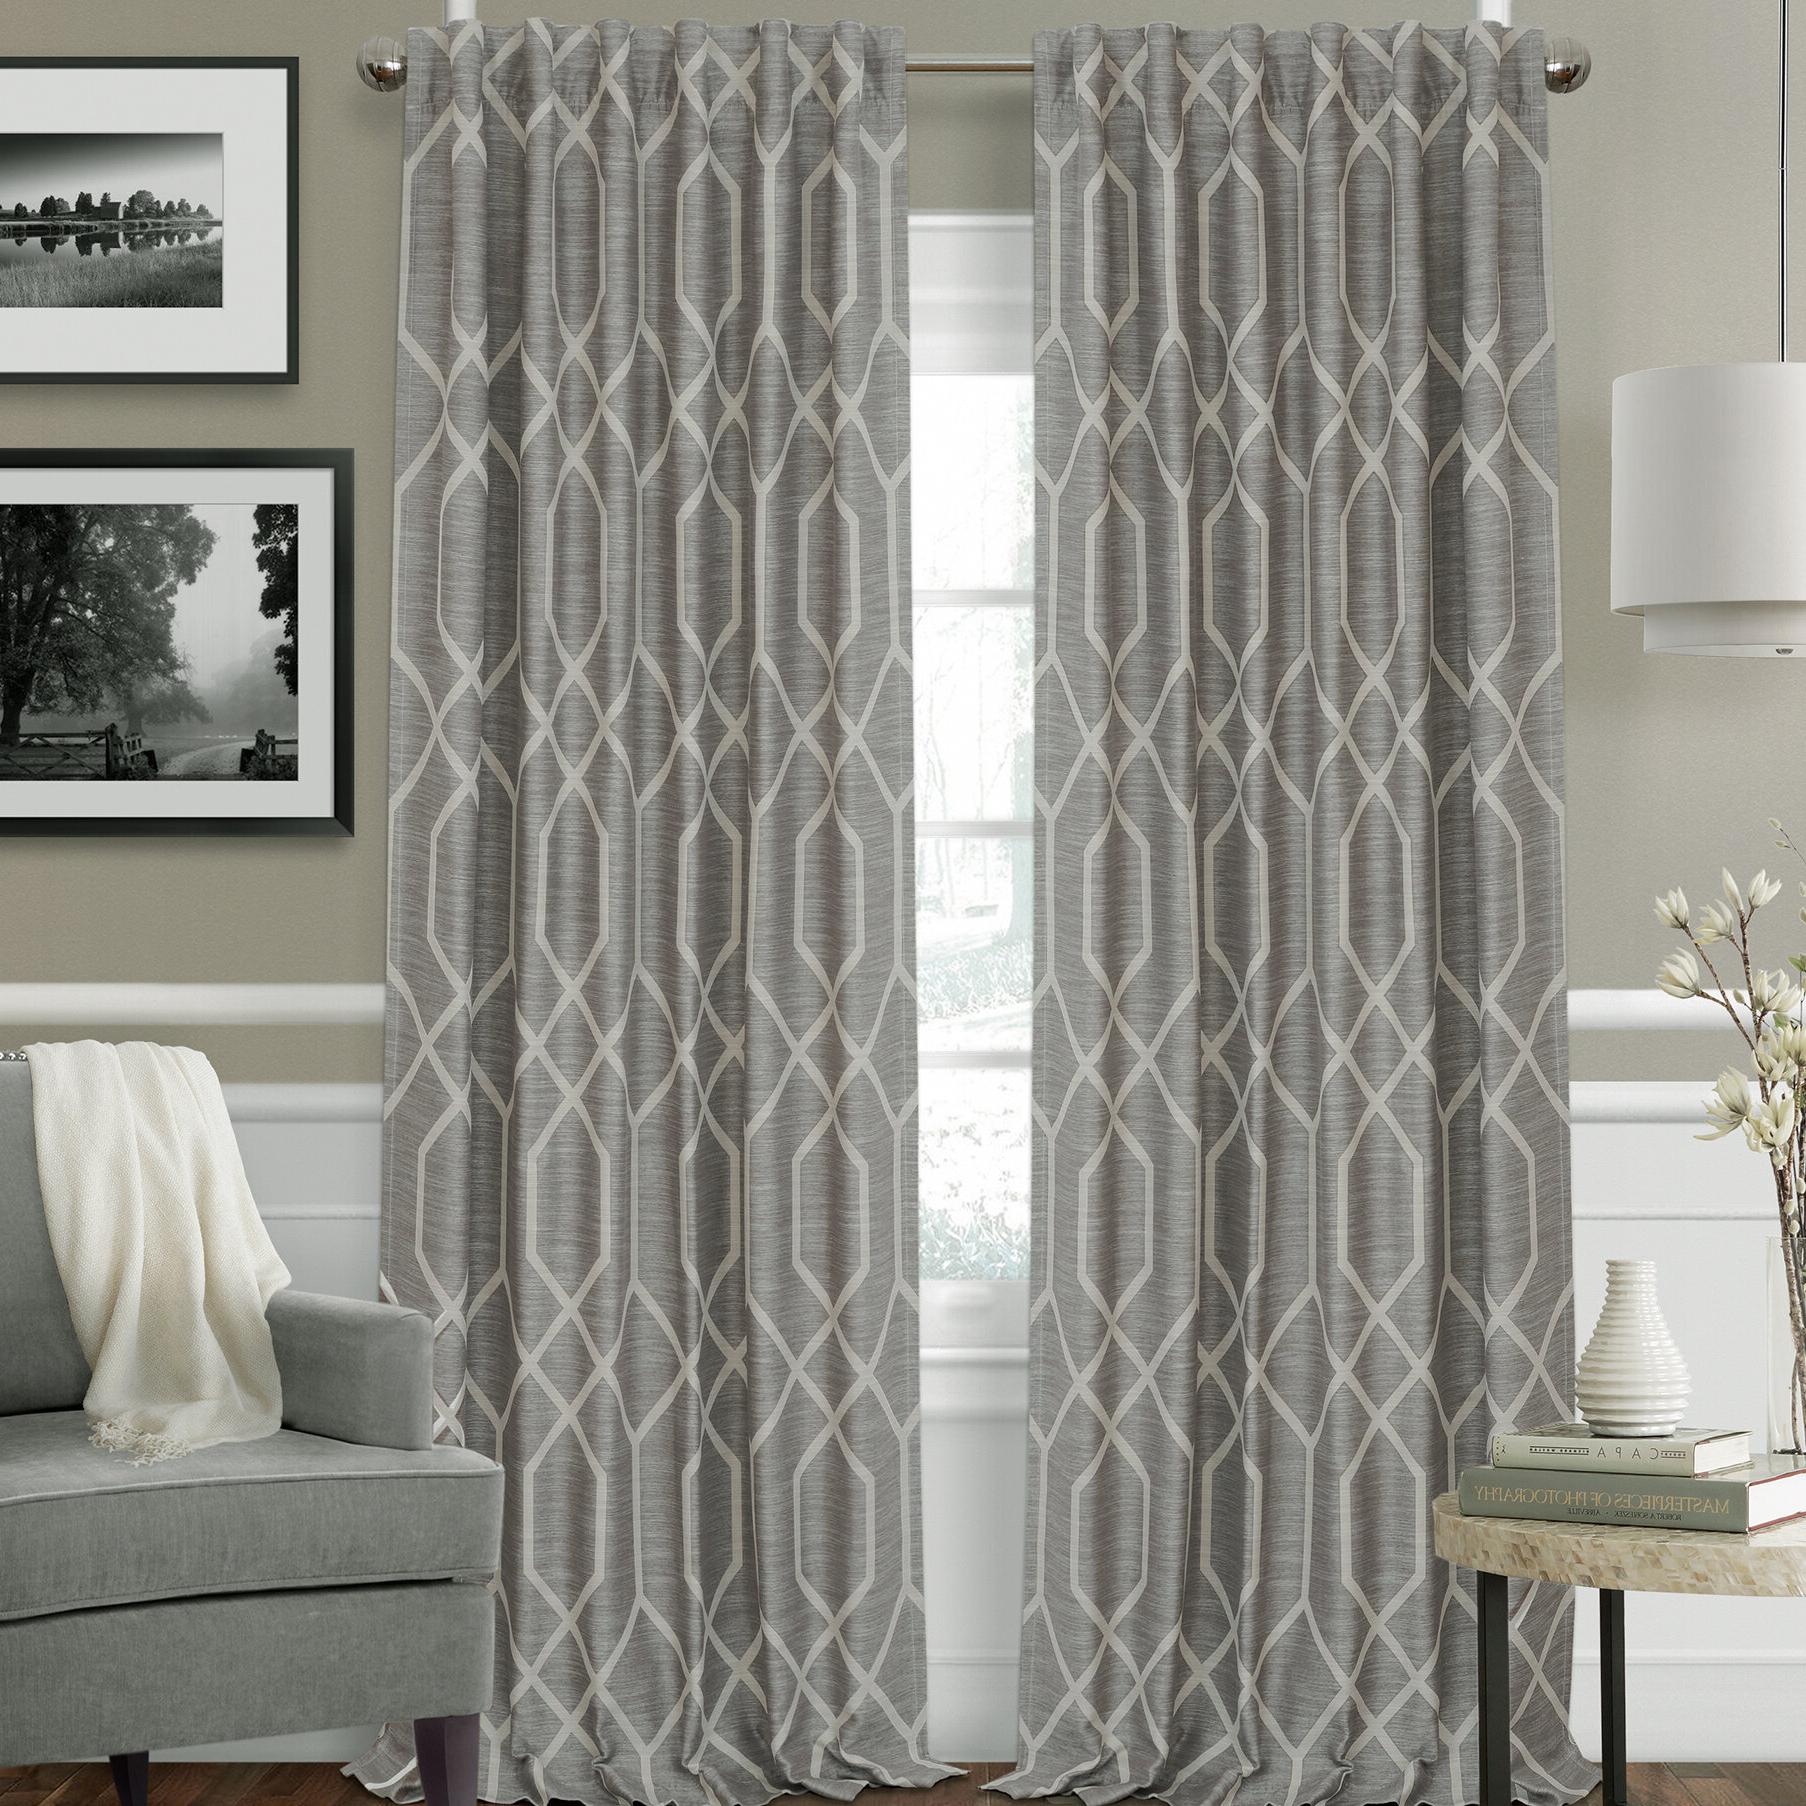 Geometric Linen Room Darkening Window Curtains In Recent Beyer Geometric Room Darkening Rod Pocket Single Curtain Panel (View 7 of 20)